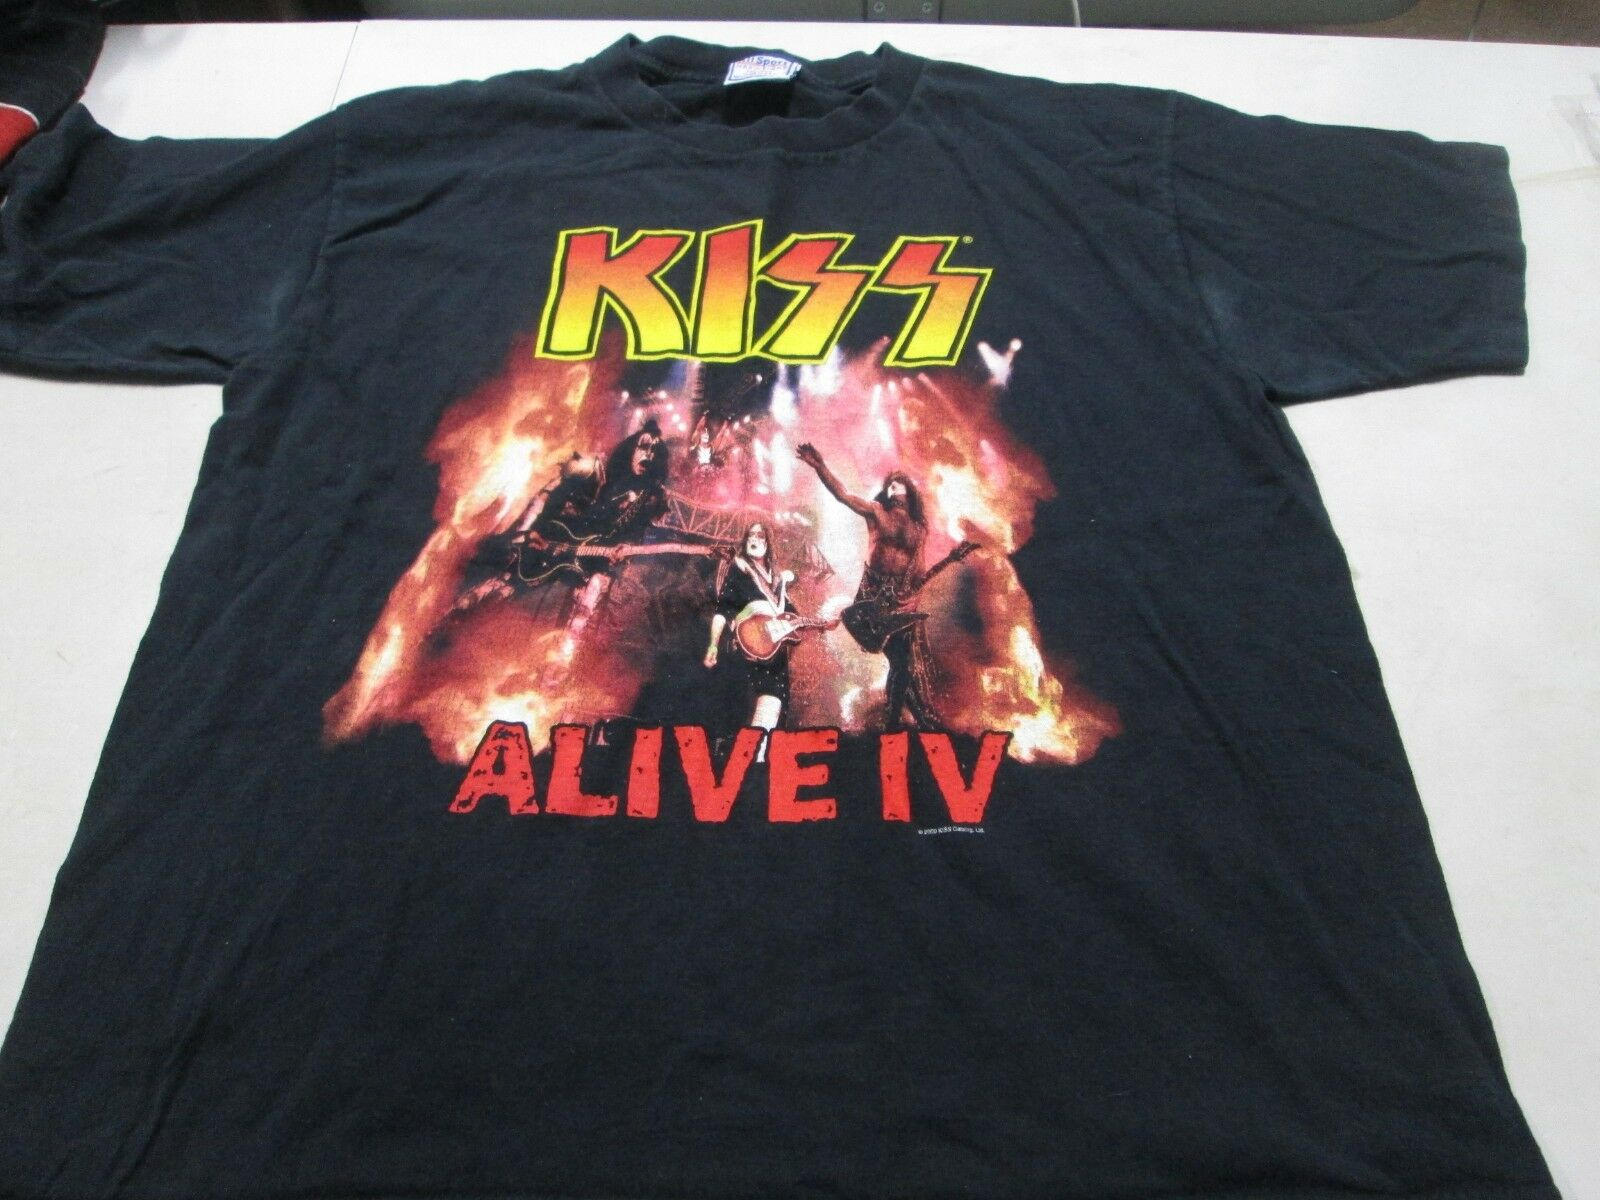 Kiss Alive IV Concert T-Shirt